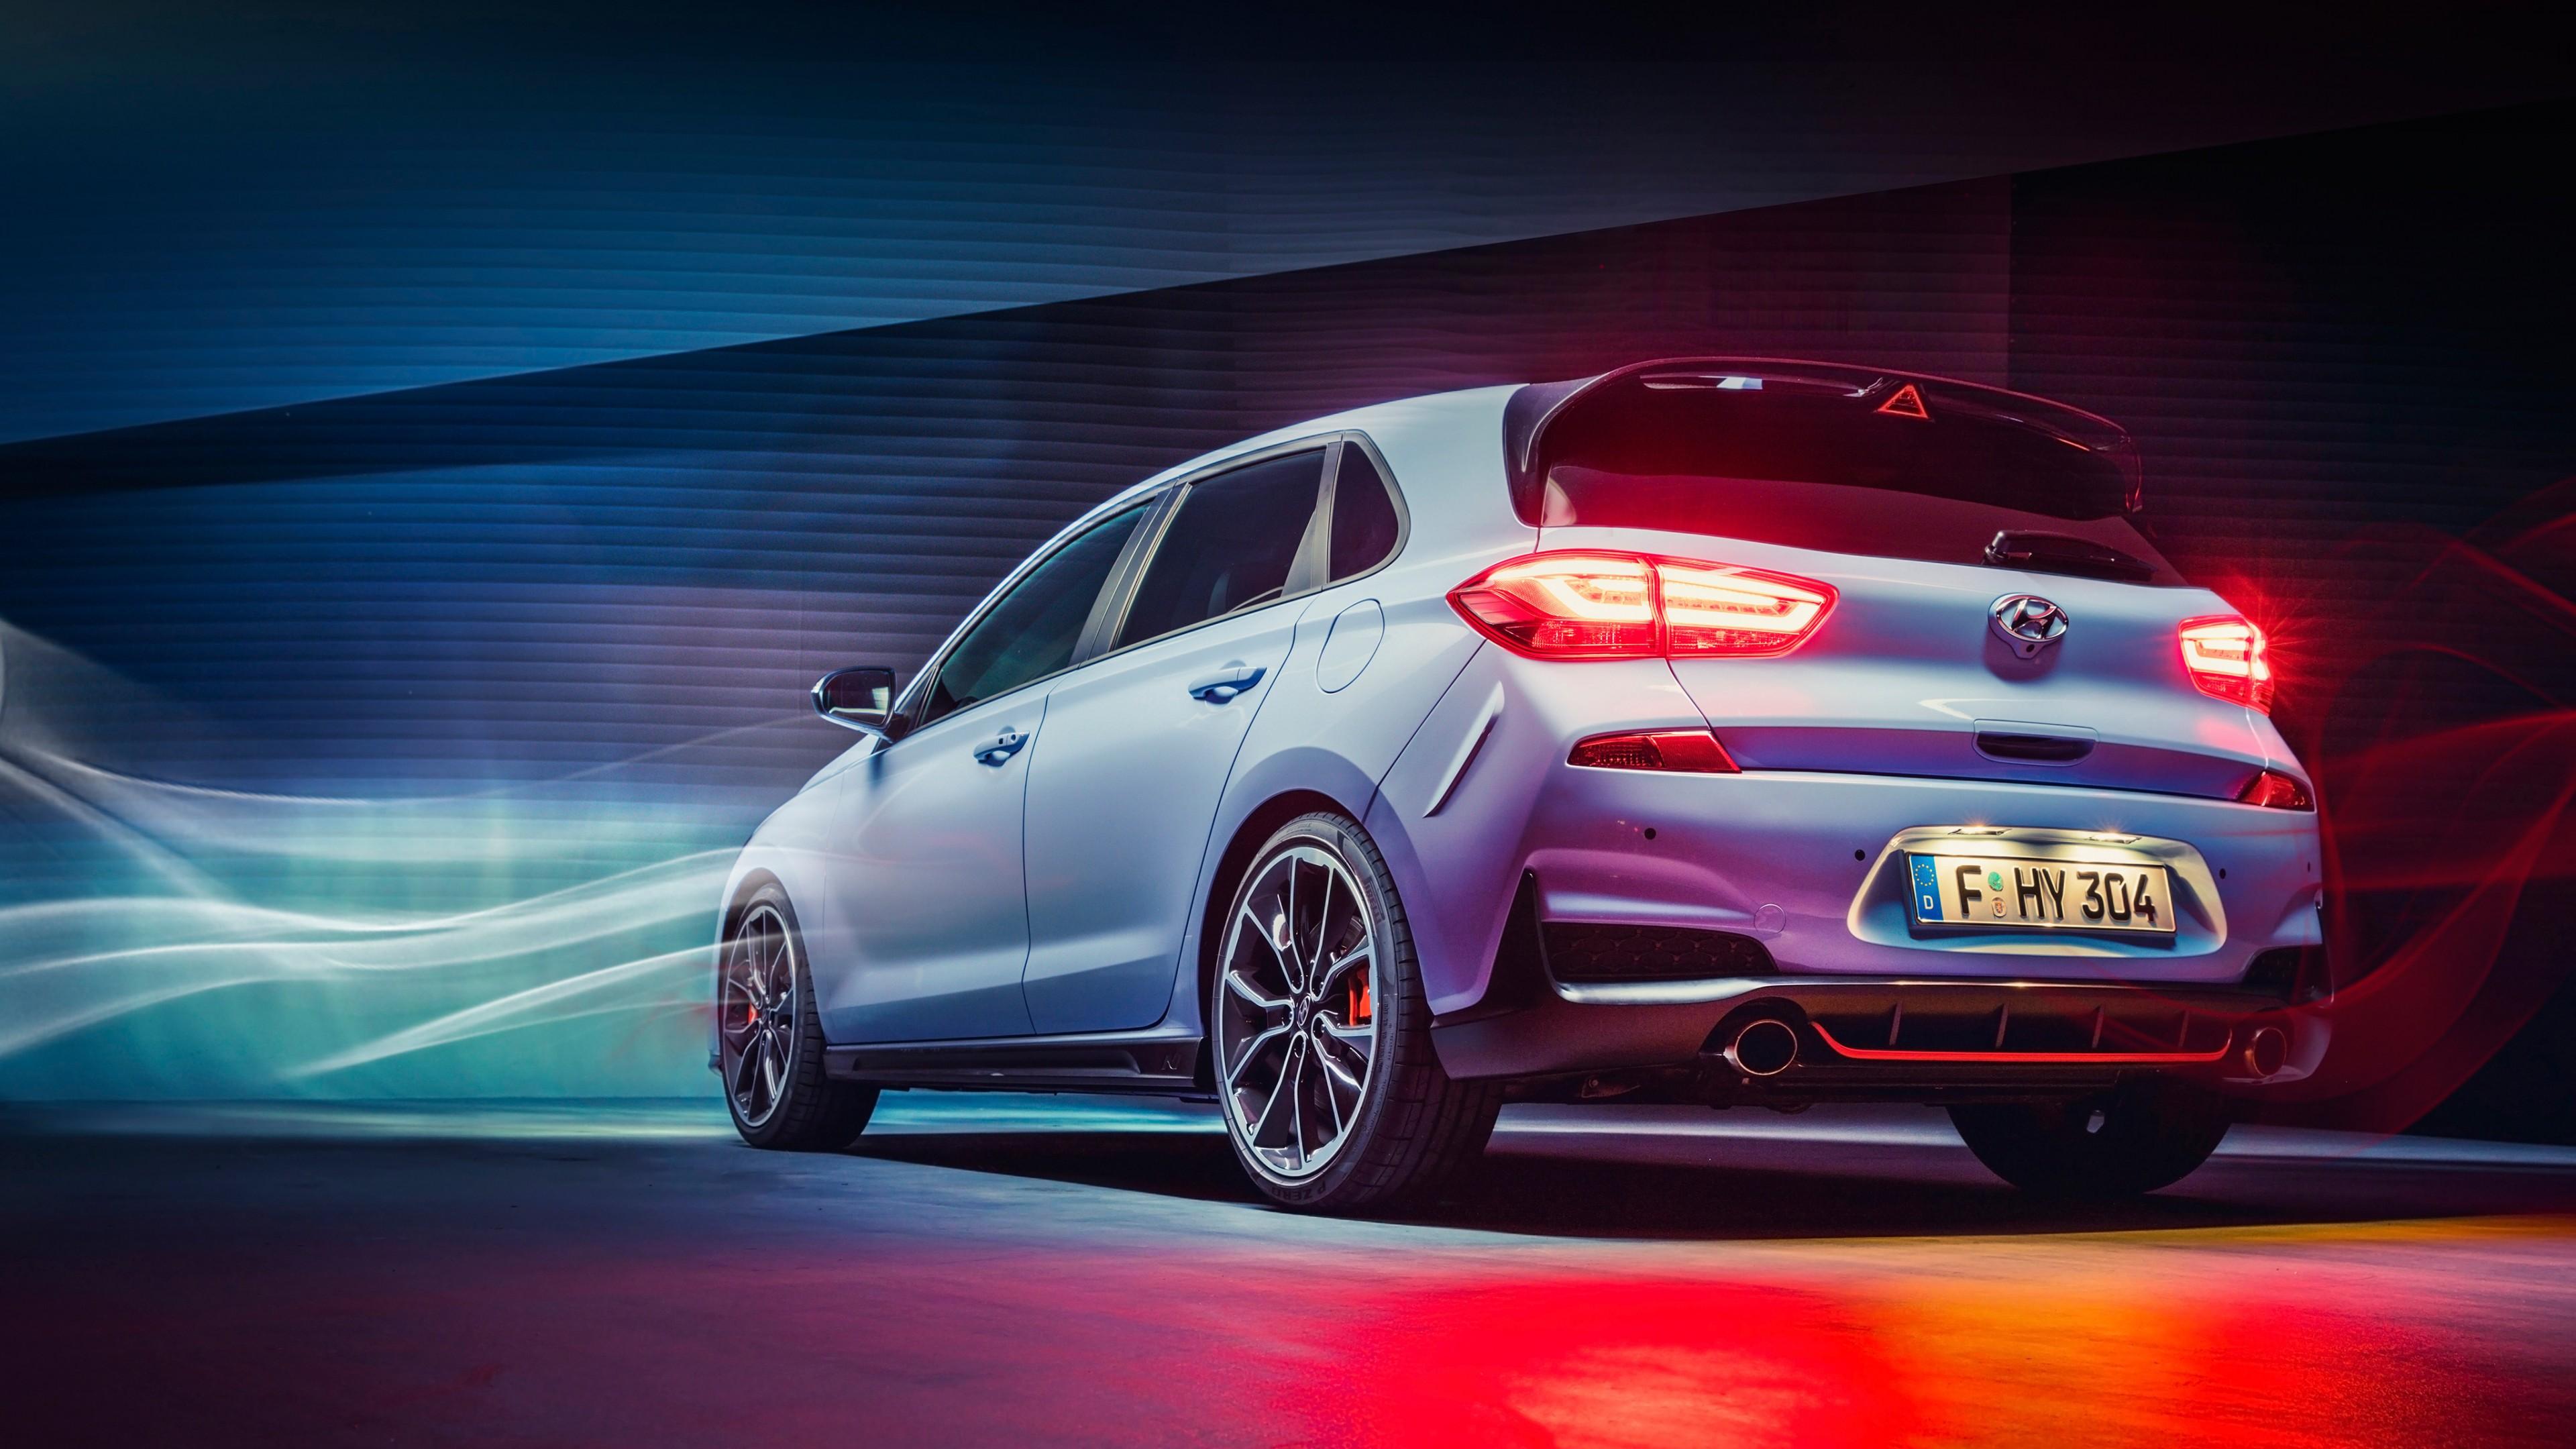 Honda City Car Hd Wallpaper Download Hyundai I30 N 2017 Rear Wallpaper Hd Car Wallpapers Id